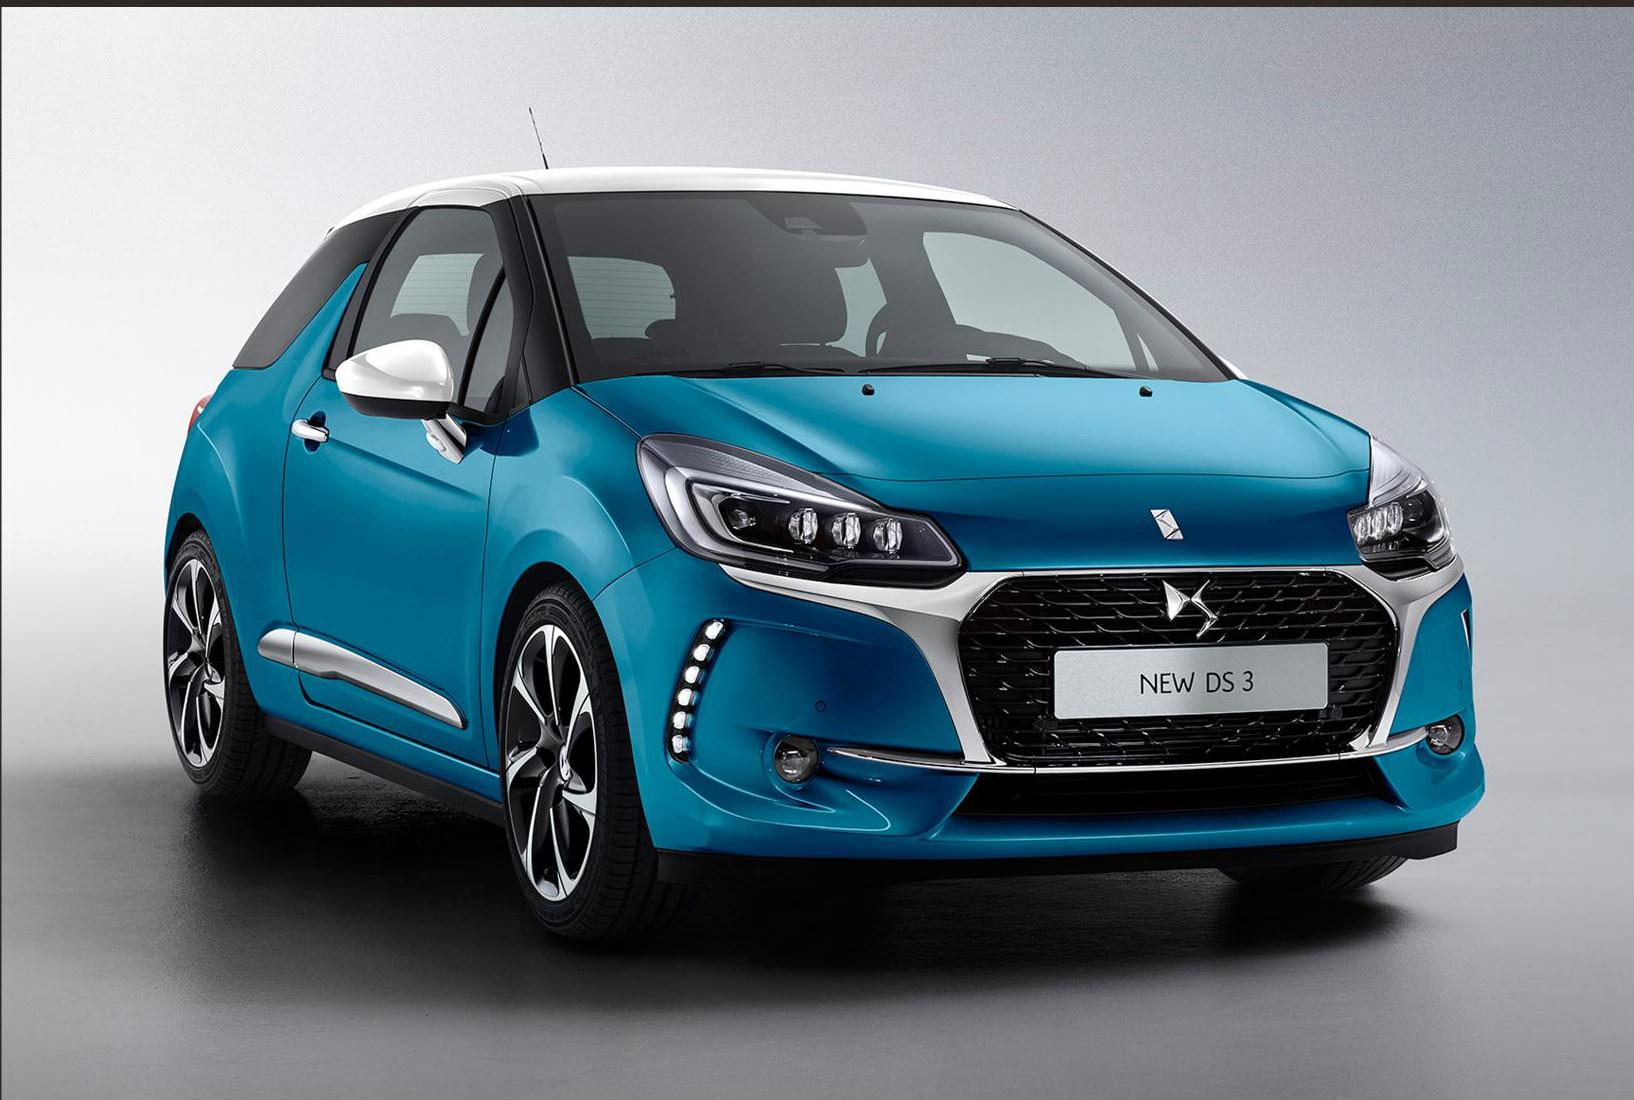 image of a blue ds 3 car exterior